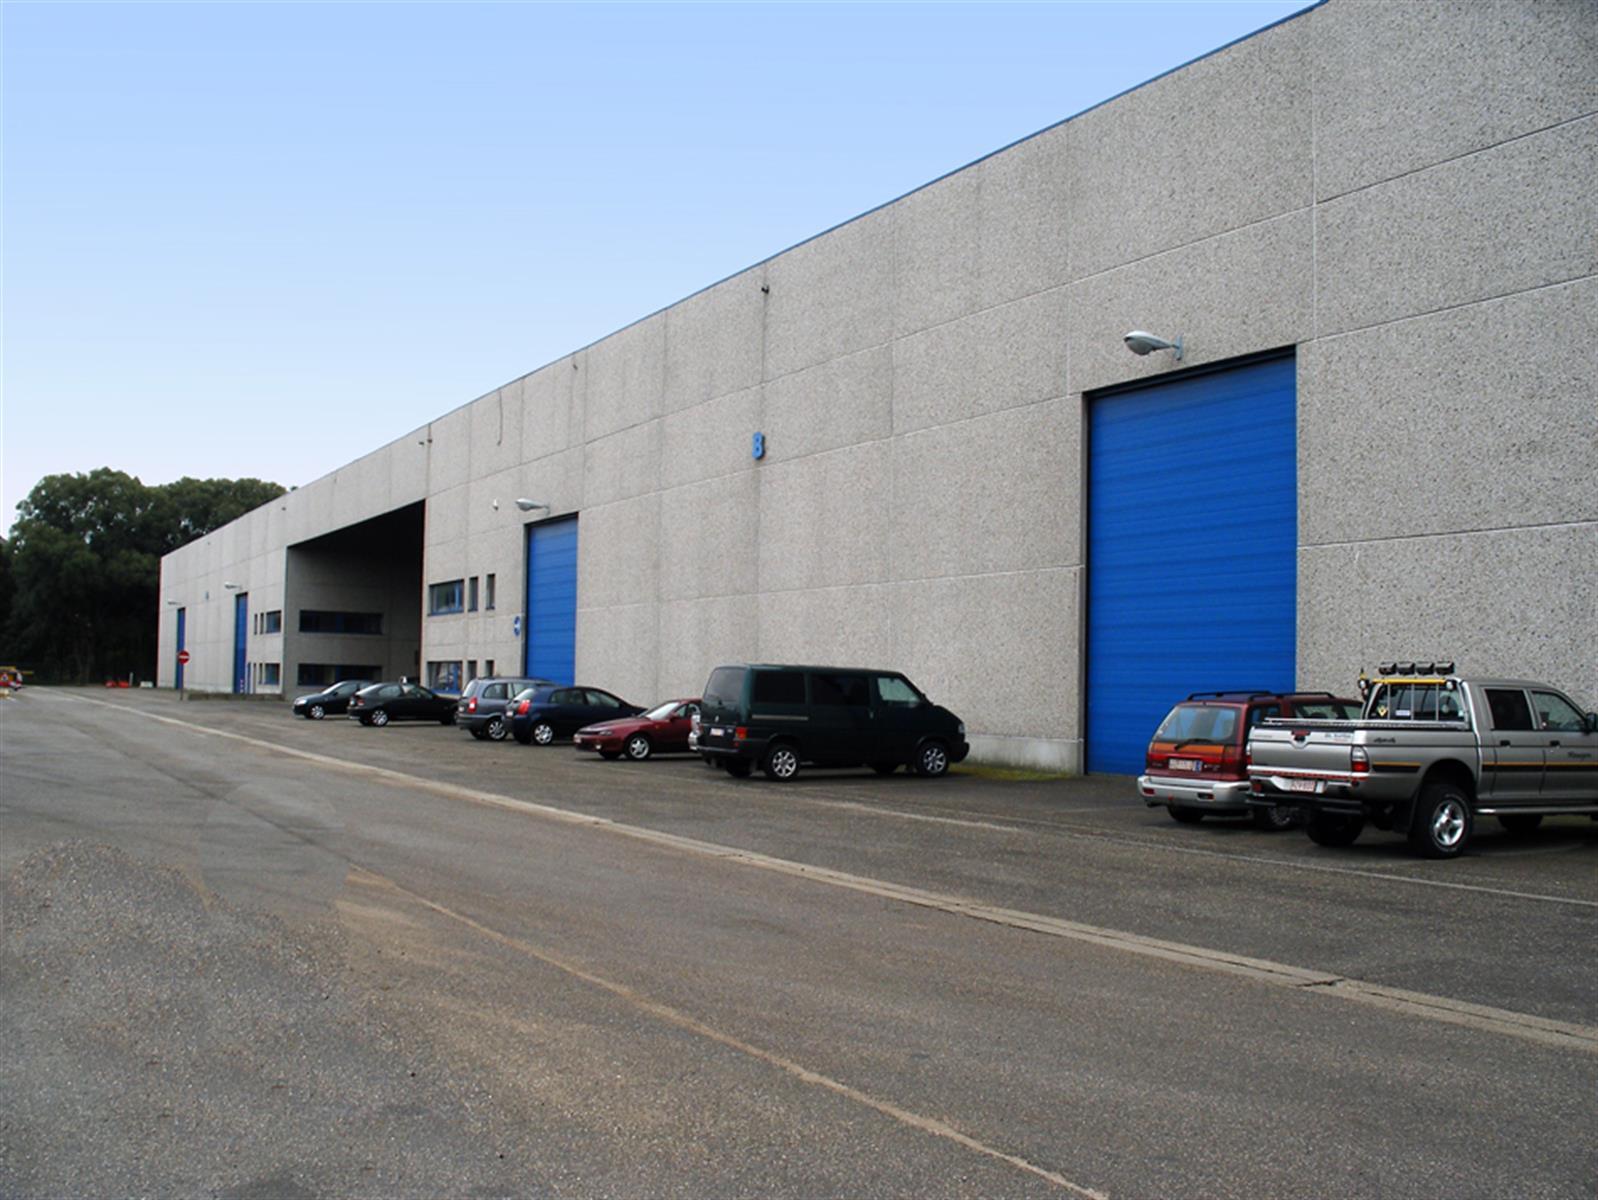 industrieel gebouw te huur KMO UNIT 1620m² MEERDERE LOADING DOCKS te KAPELLEN (B002) 1640m² - 2950 Kapellen, België 4